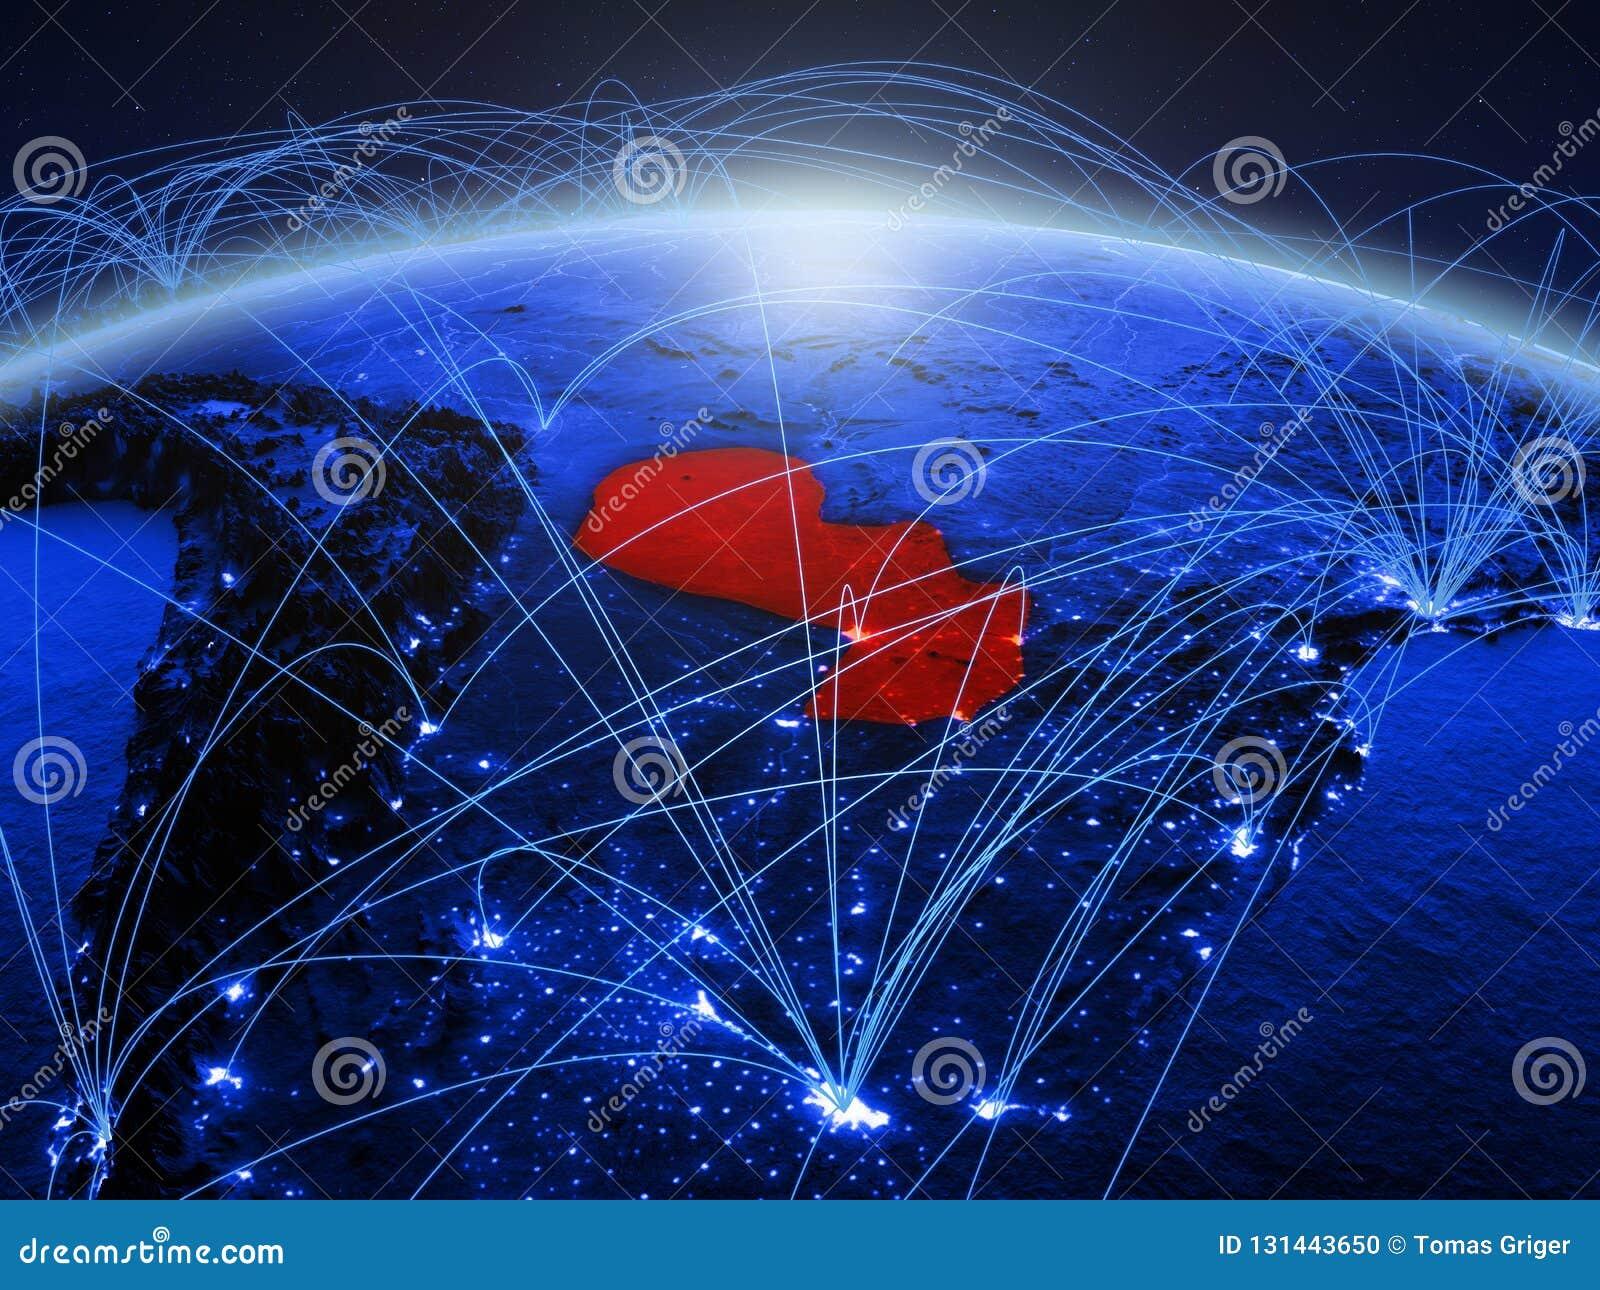 Paraguay op blauwe digitale aarde met internationaal netwerk die mededeling, reis en verbindingen vertegenwoordigen 3d